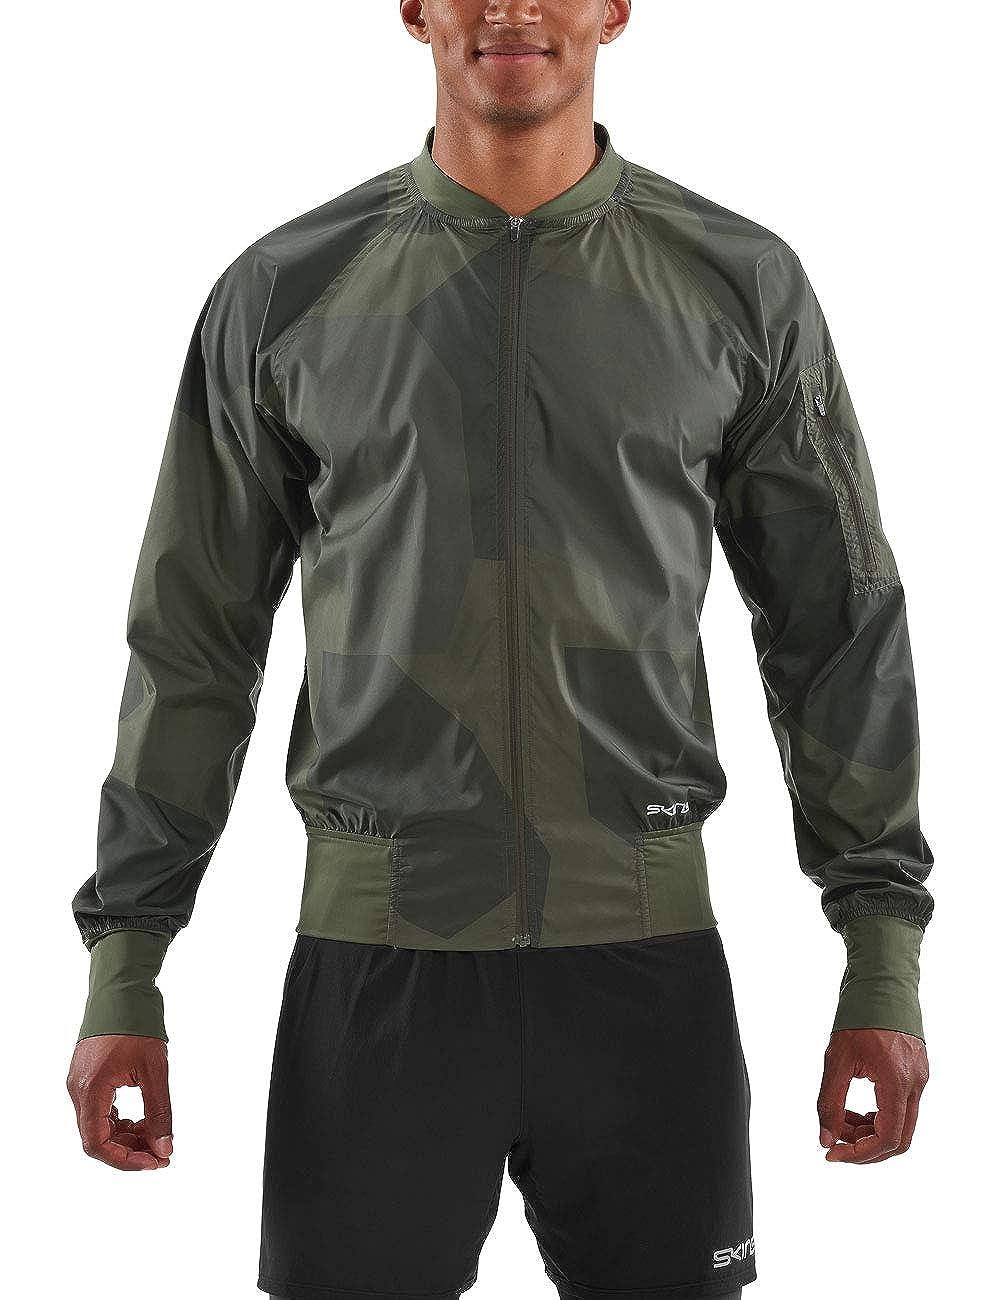 Skins Activewear Orsa Mens Bomber Run Jacket Deconstructed Camo Ut X-Large Utility